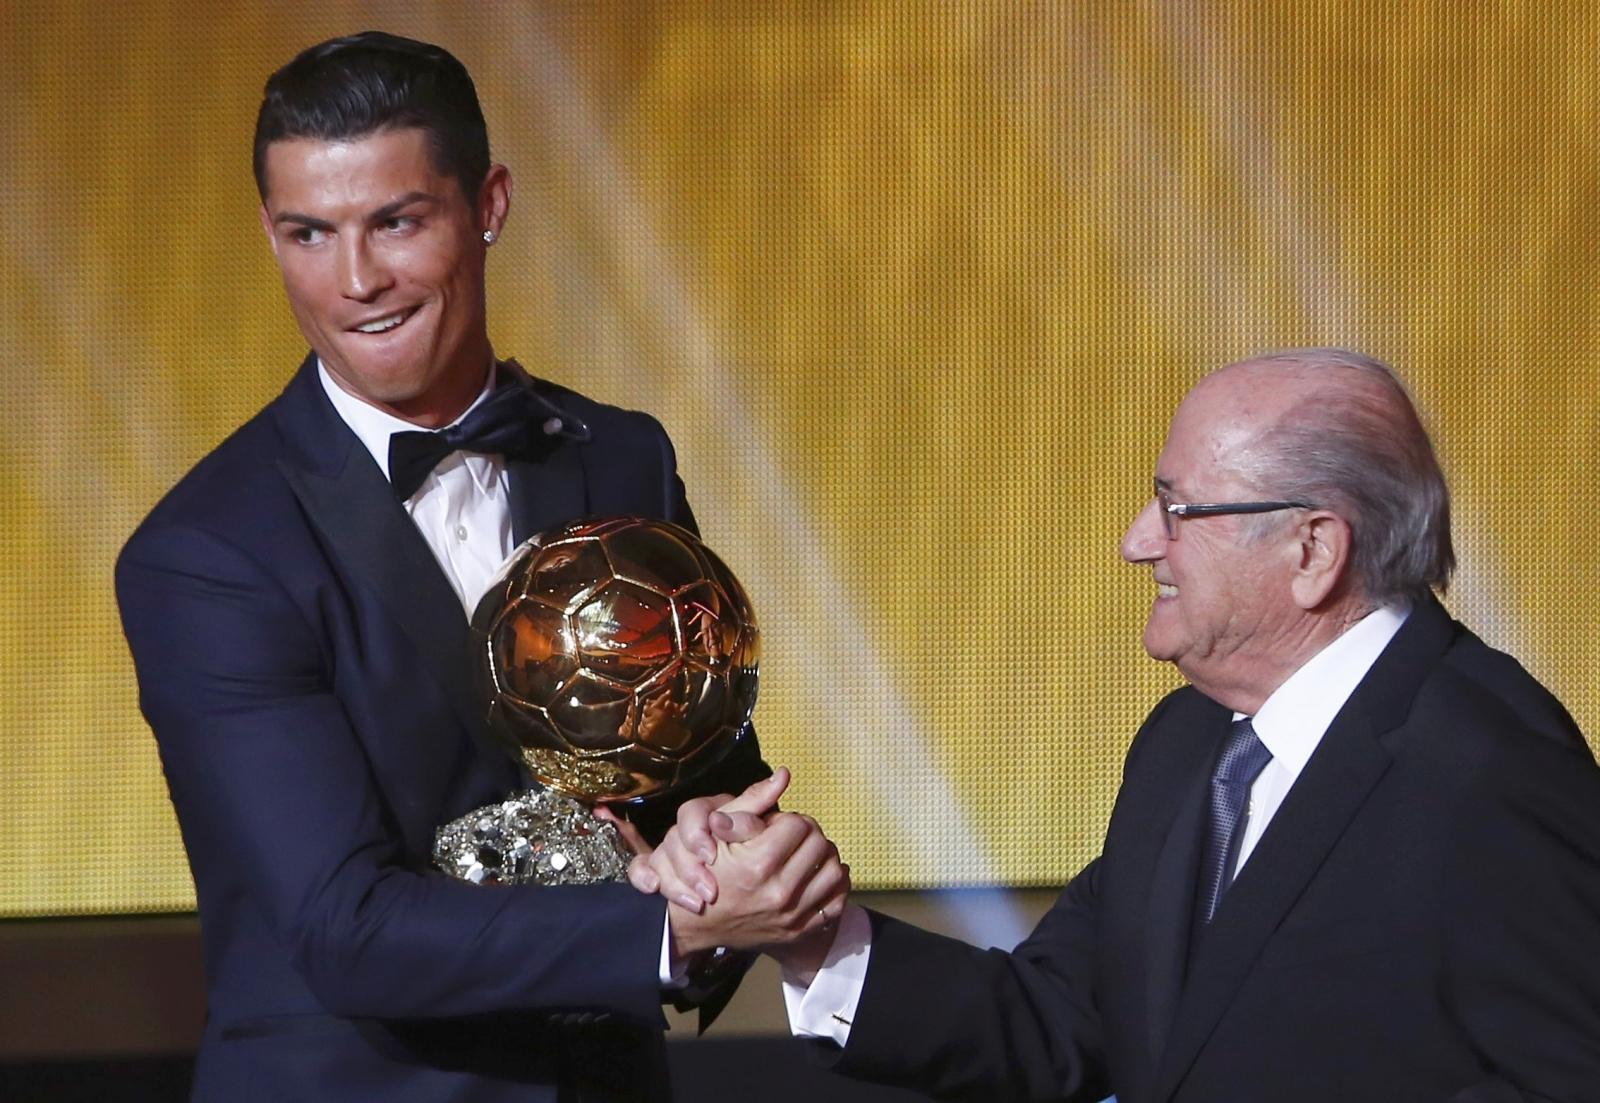 Ballon d'Or 2014: Cristiano Ronaldo beats Messi and Neuer to win award